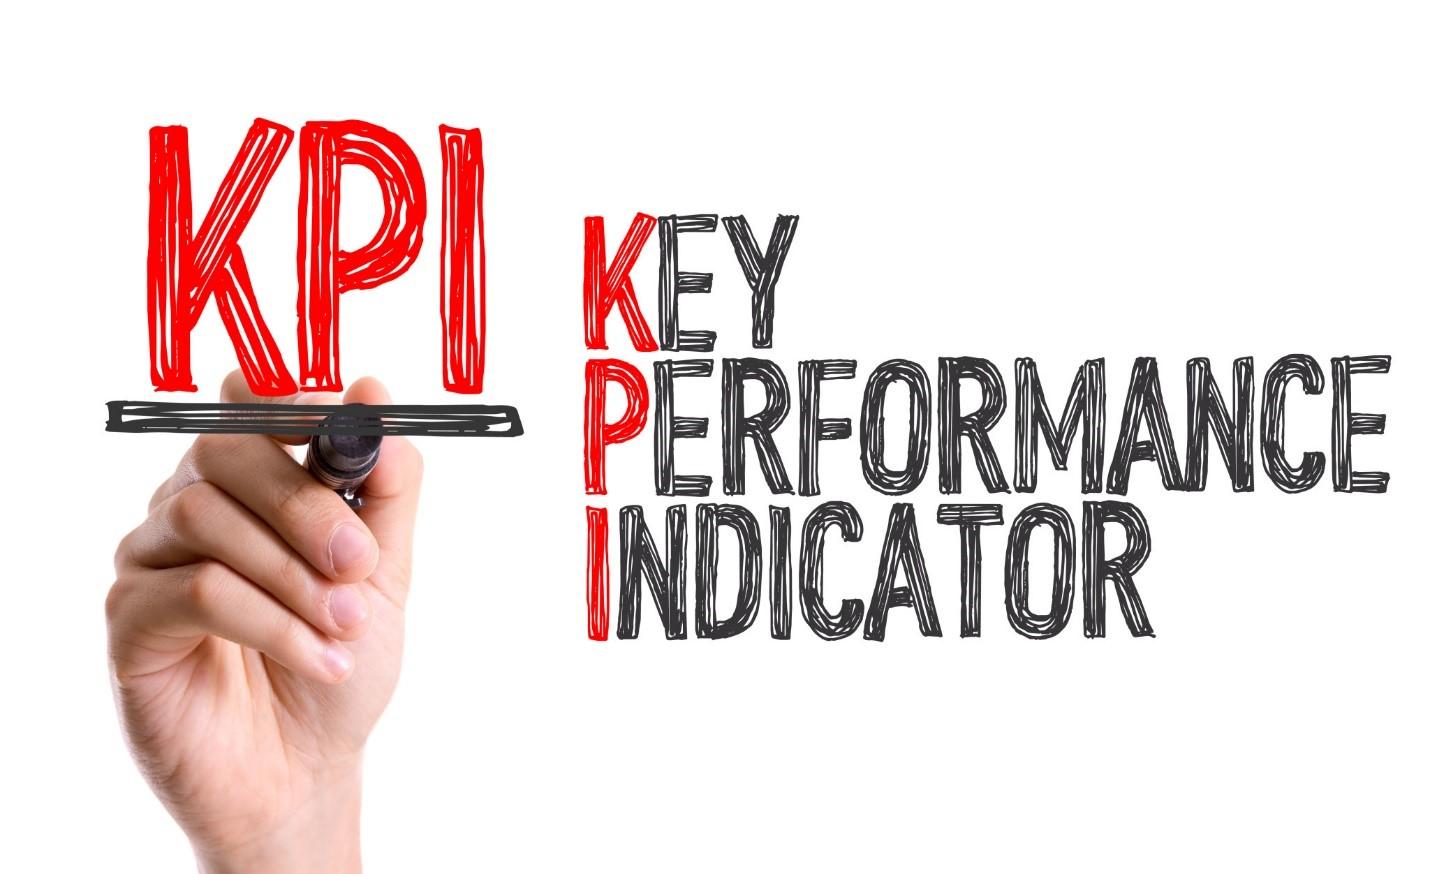 KPI image3 - شاخص های کلیدی عملکرد (KPI) انواع و روش اجرا